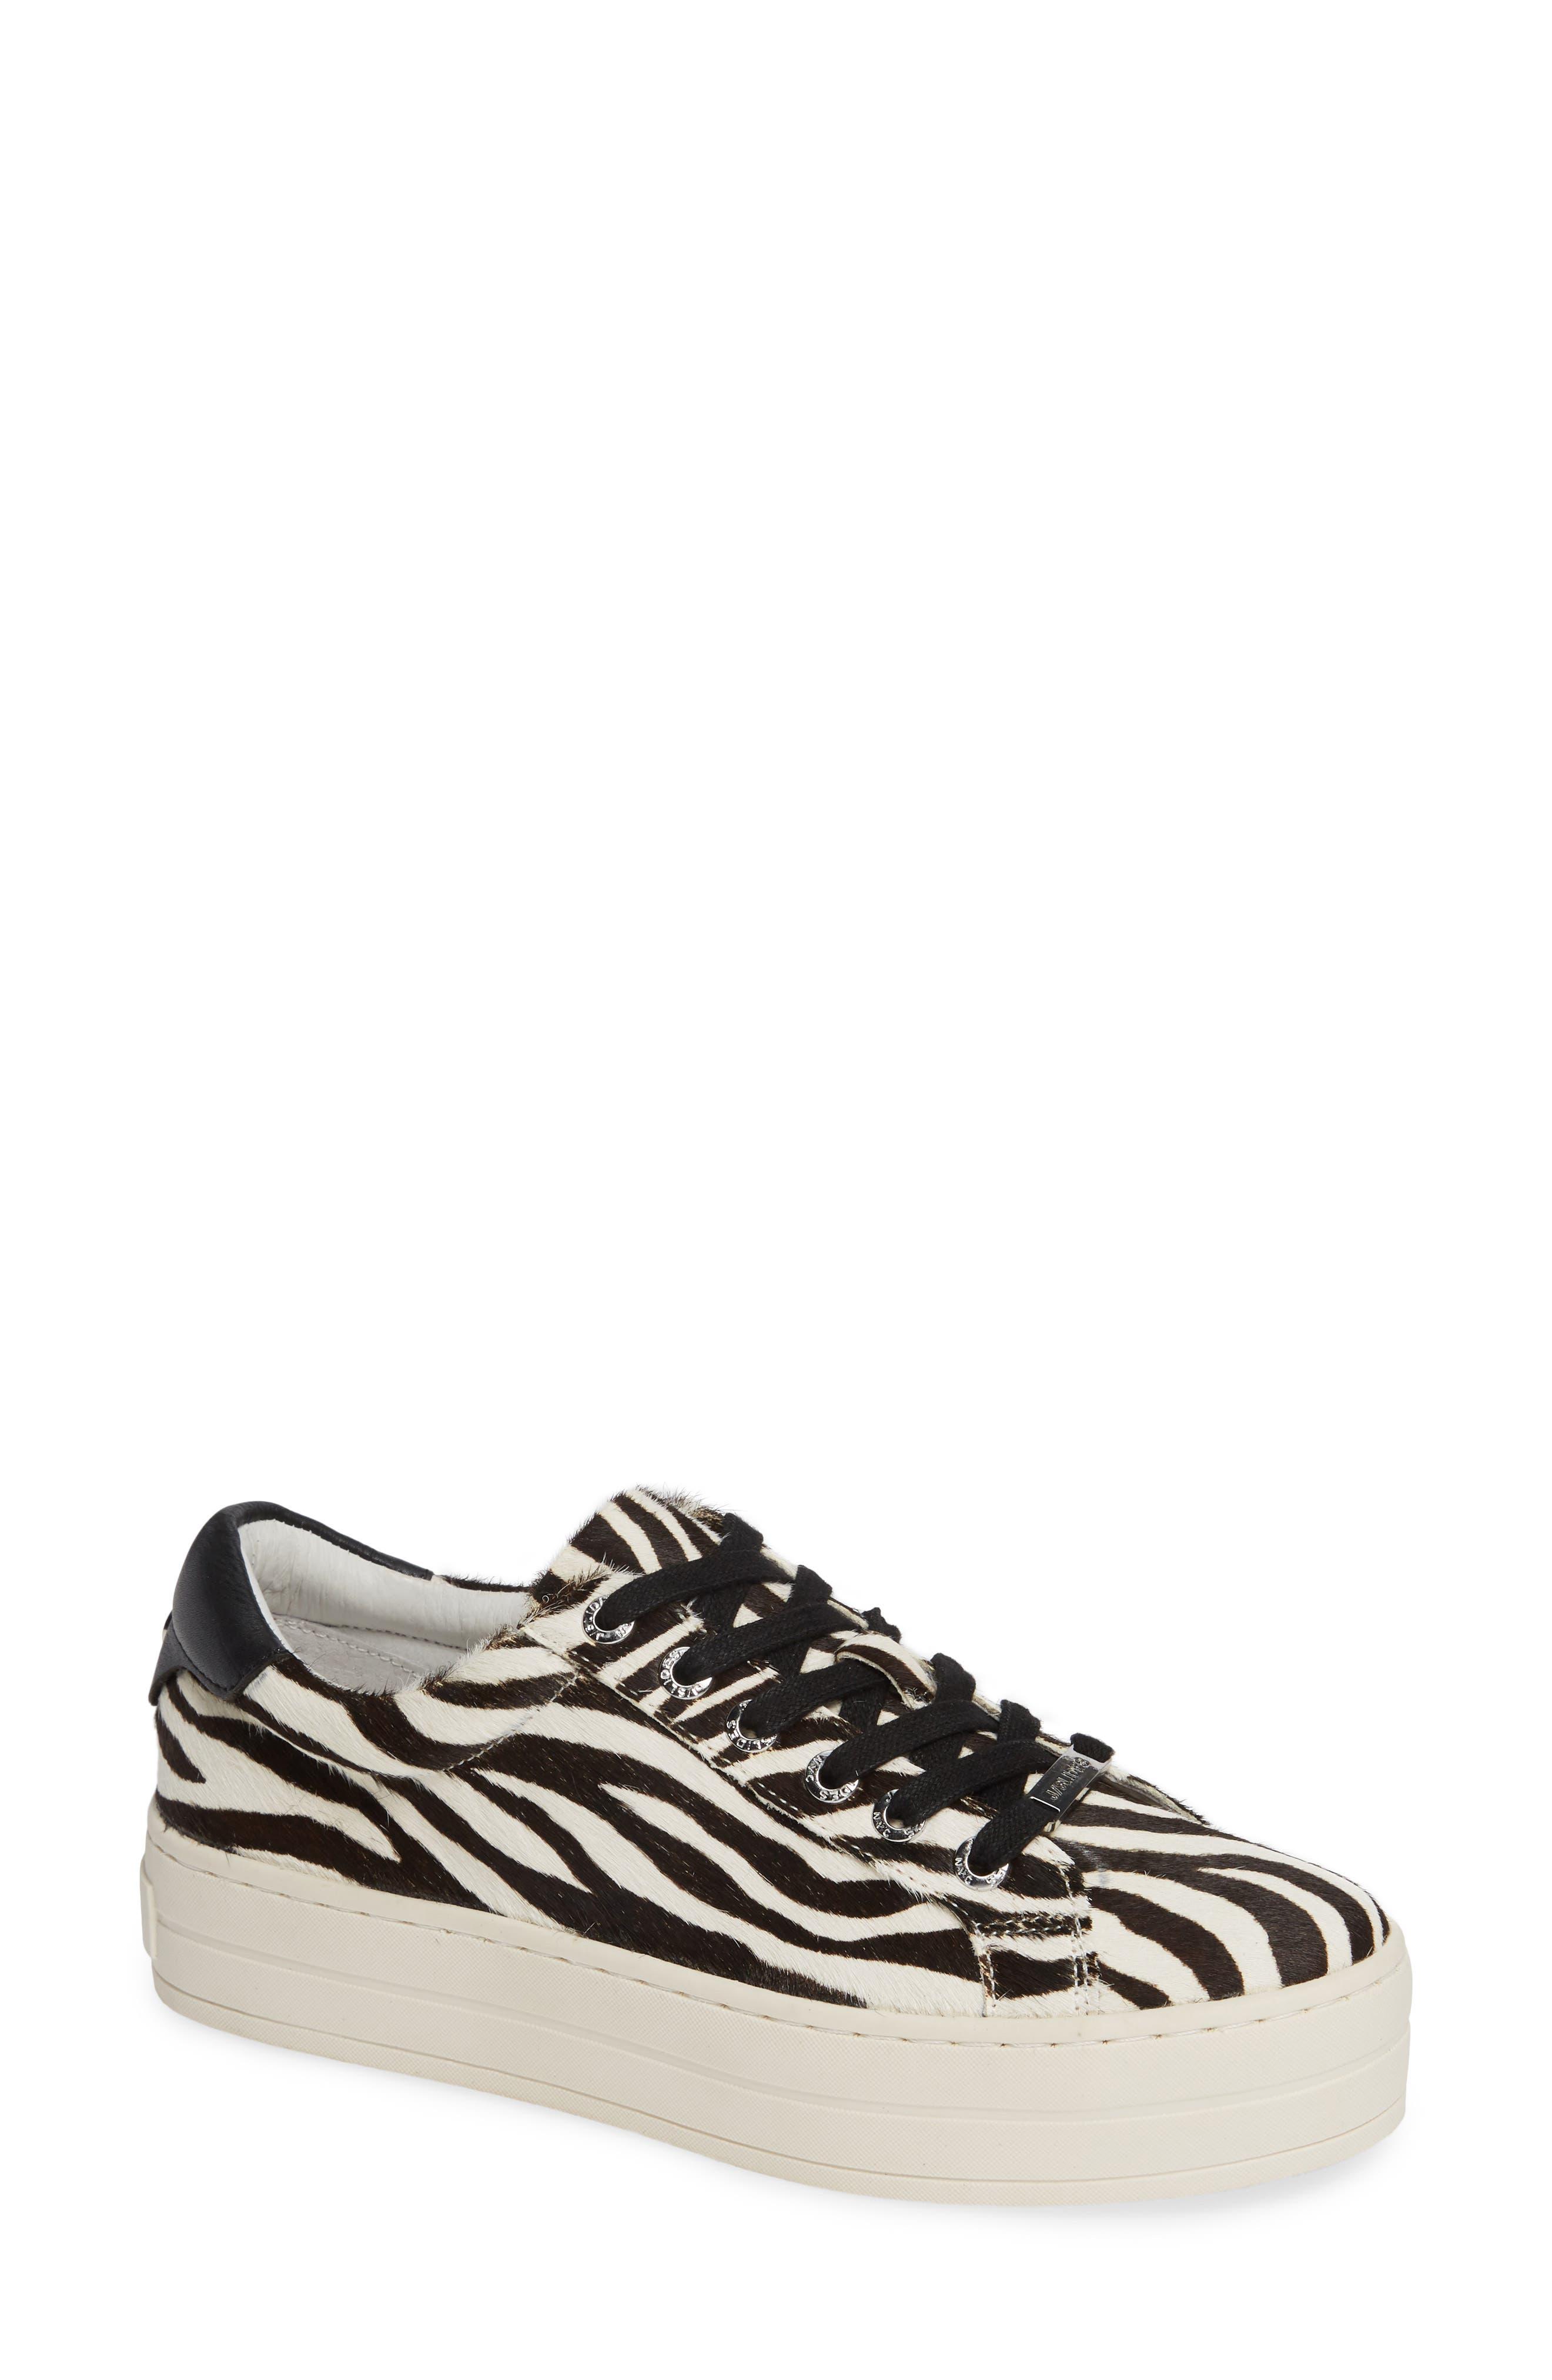 JSLIDES,                             Hippie Genuine Calf Hair Platform Sneaker,                             Main thumbnail 1, color,                             ZEBRA CALF HAIR